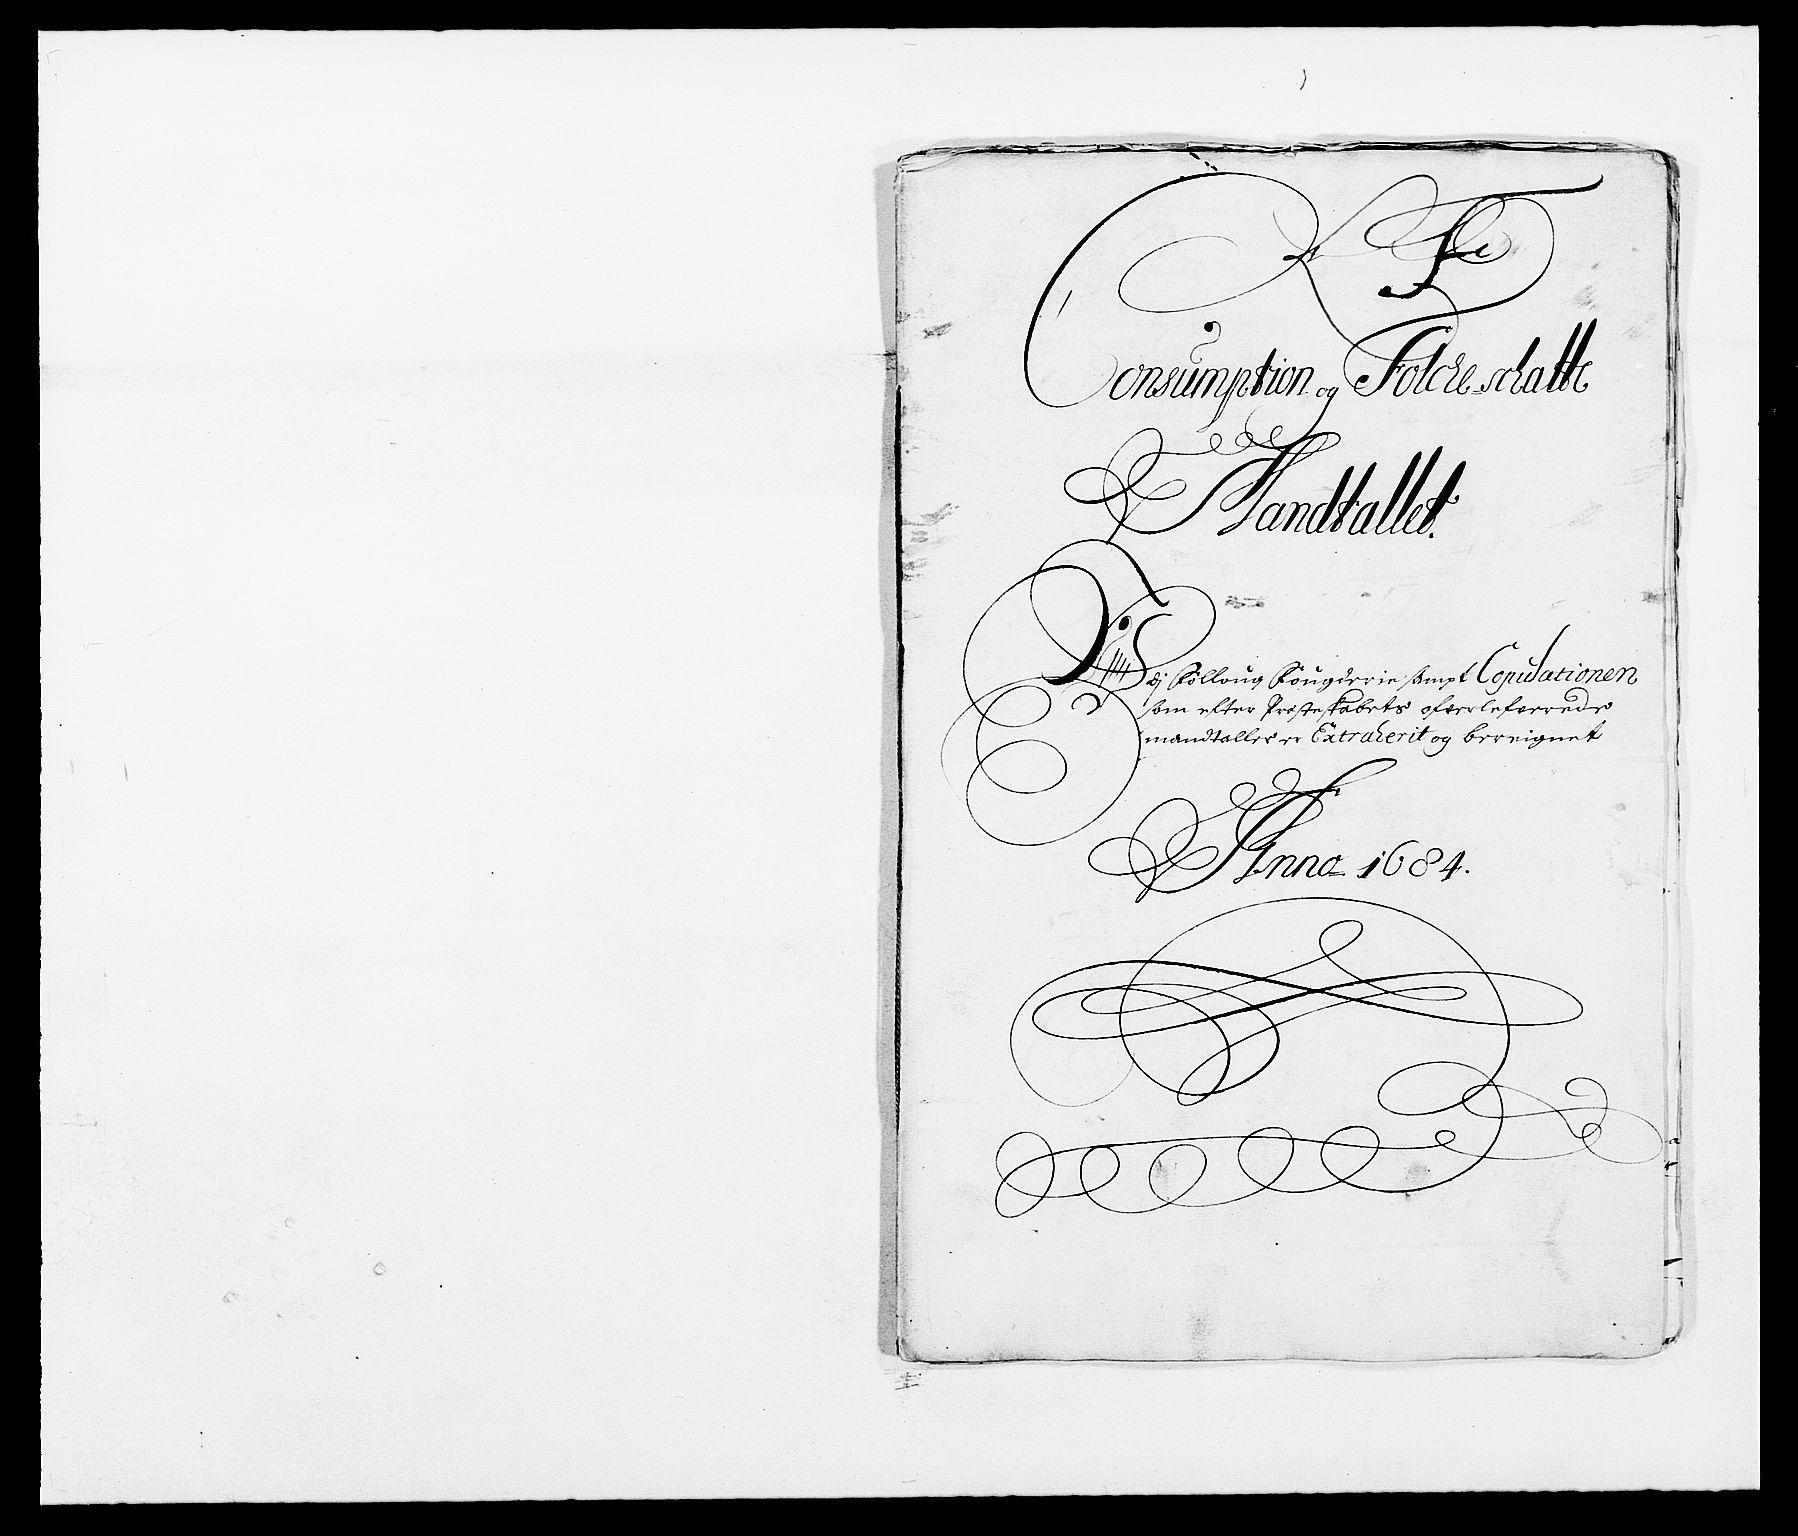 RA, Rentekammeret inntil 1814, Reviderte regnskaper, Fogderegnskap, R09/L0431: Fogderegnskap Follo, 1684, s. 189